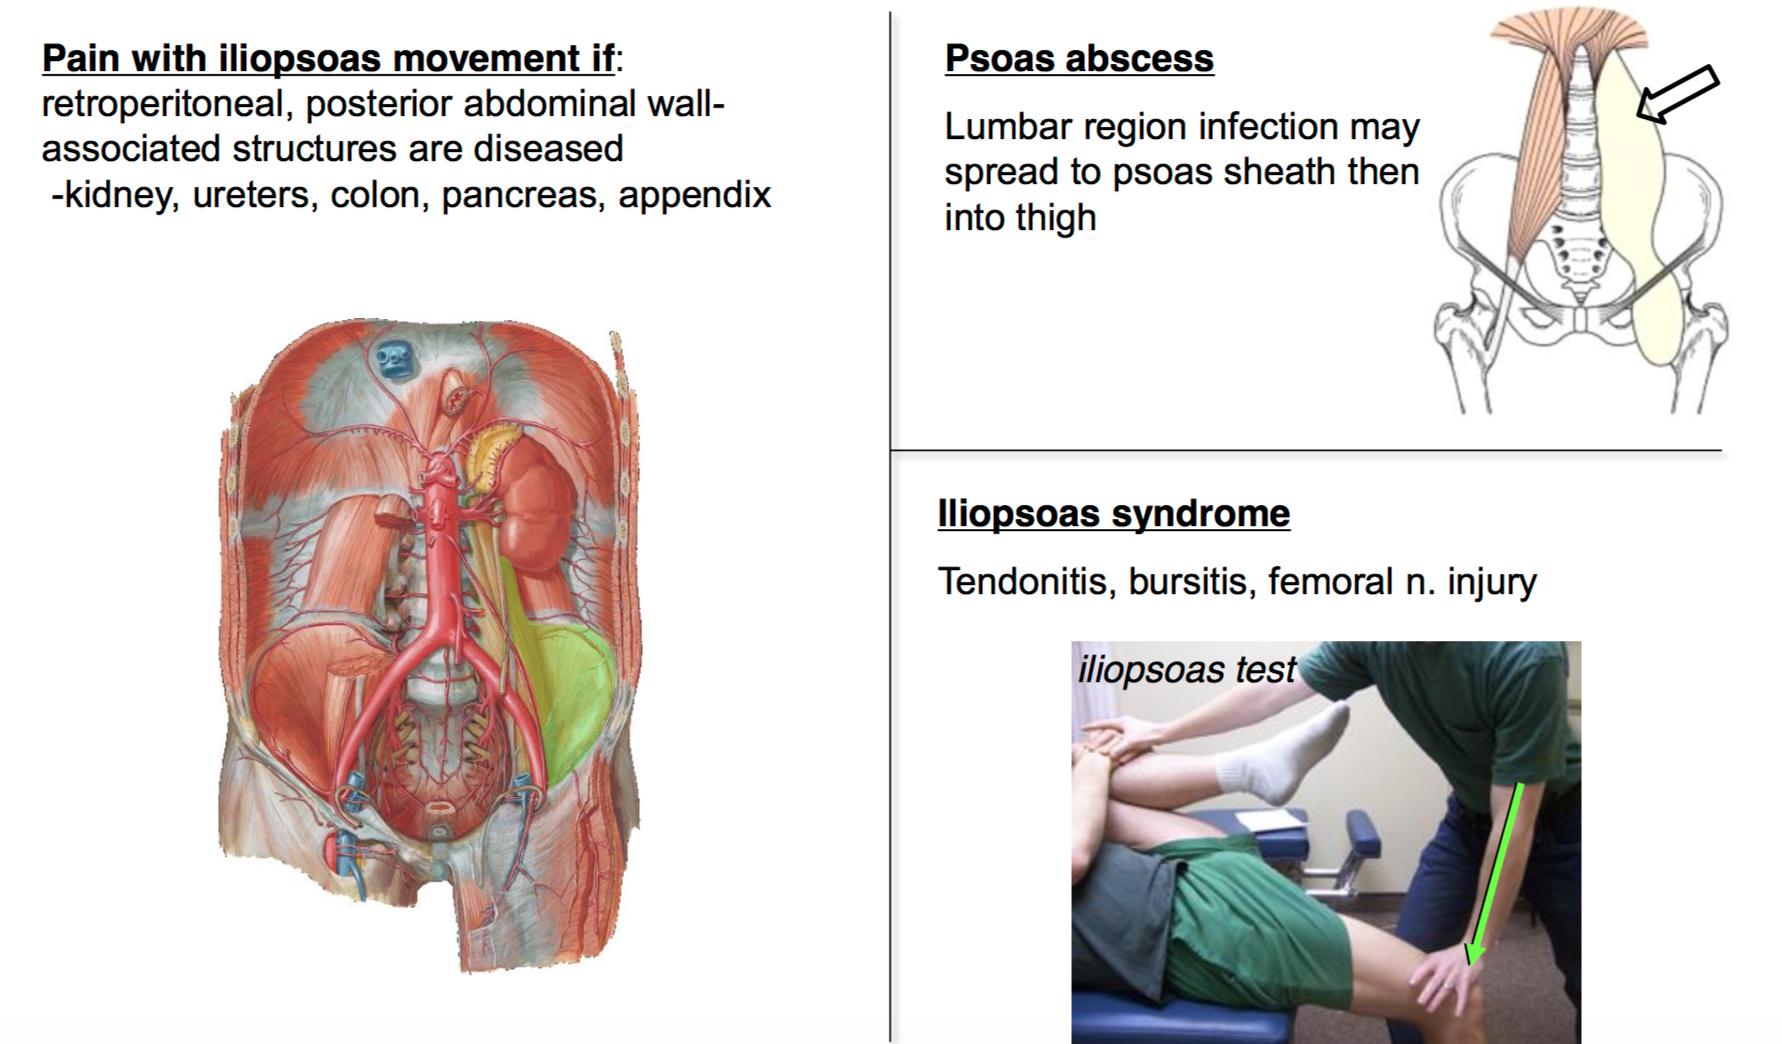 Unit 2 anatomy. Term paper Academic Writing Service gressaymjom ...